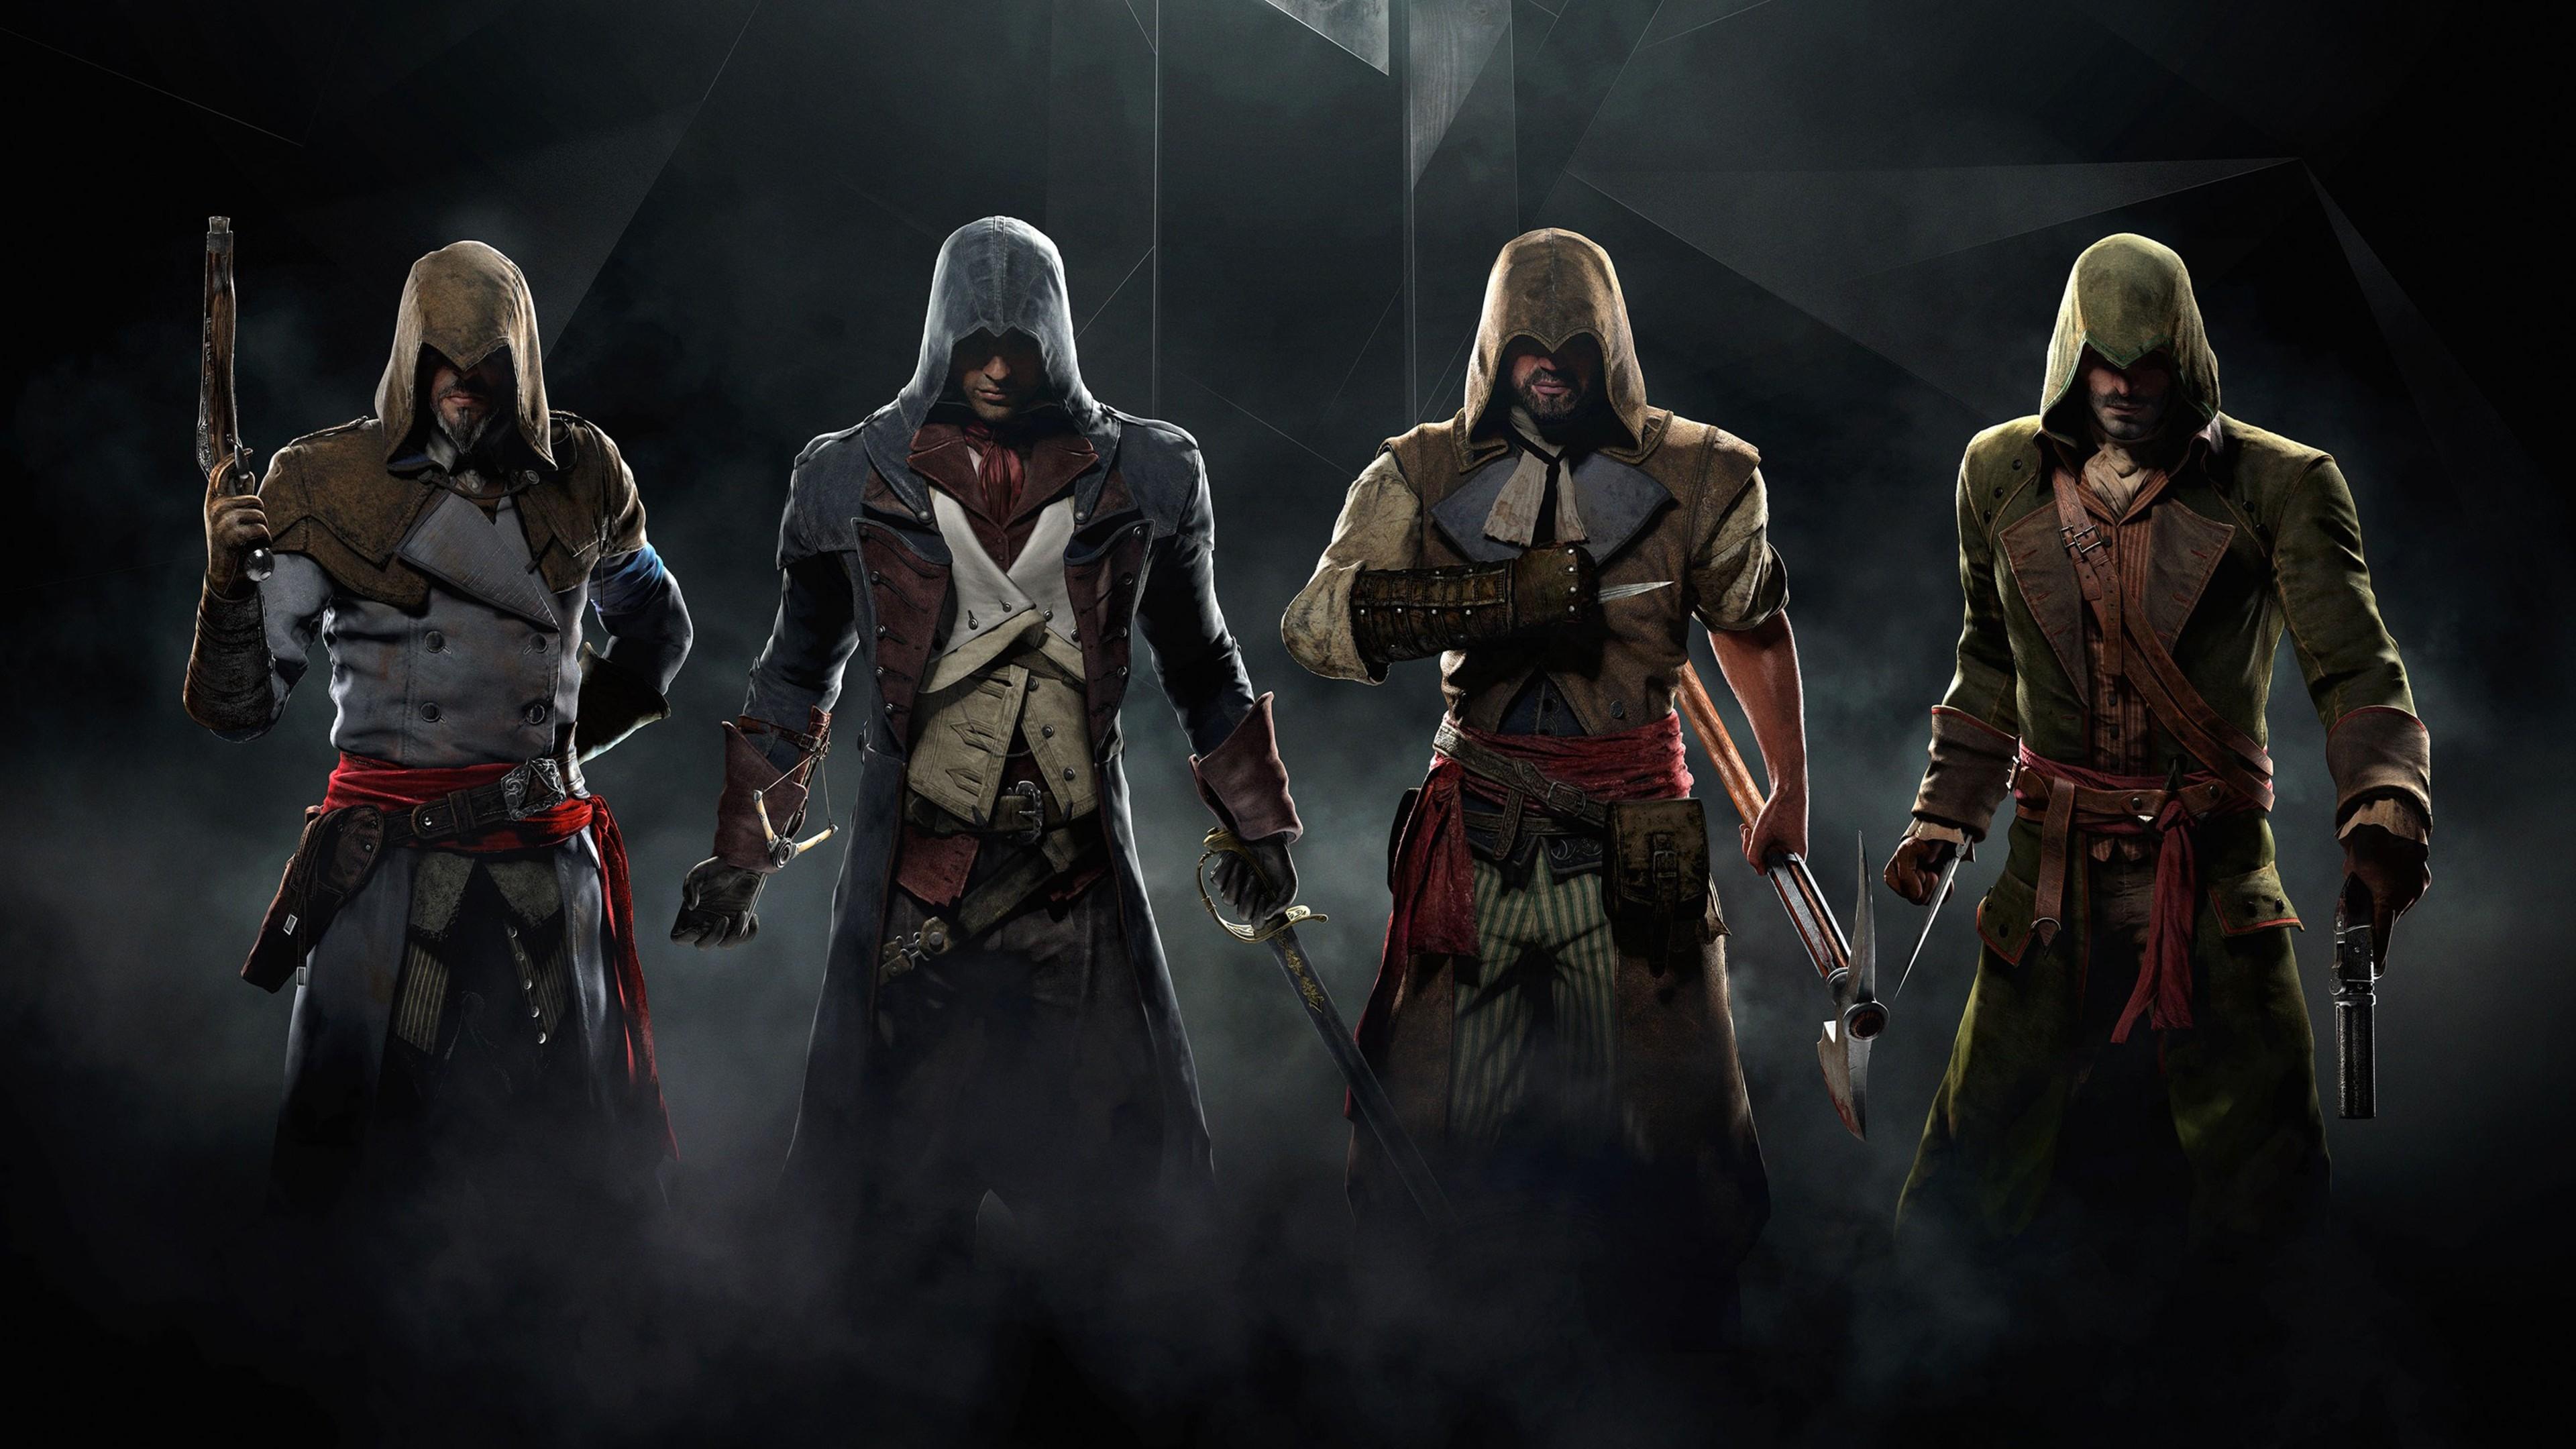 1440x900 Assassins Creed Unity Game Desktop 1440x900 Resolution Hd